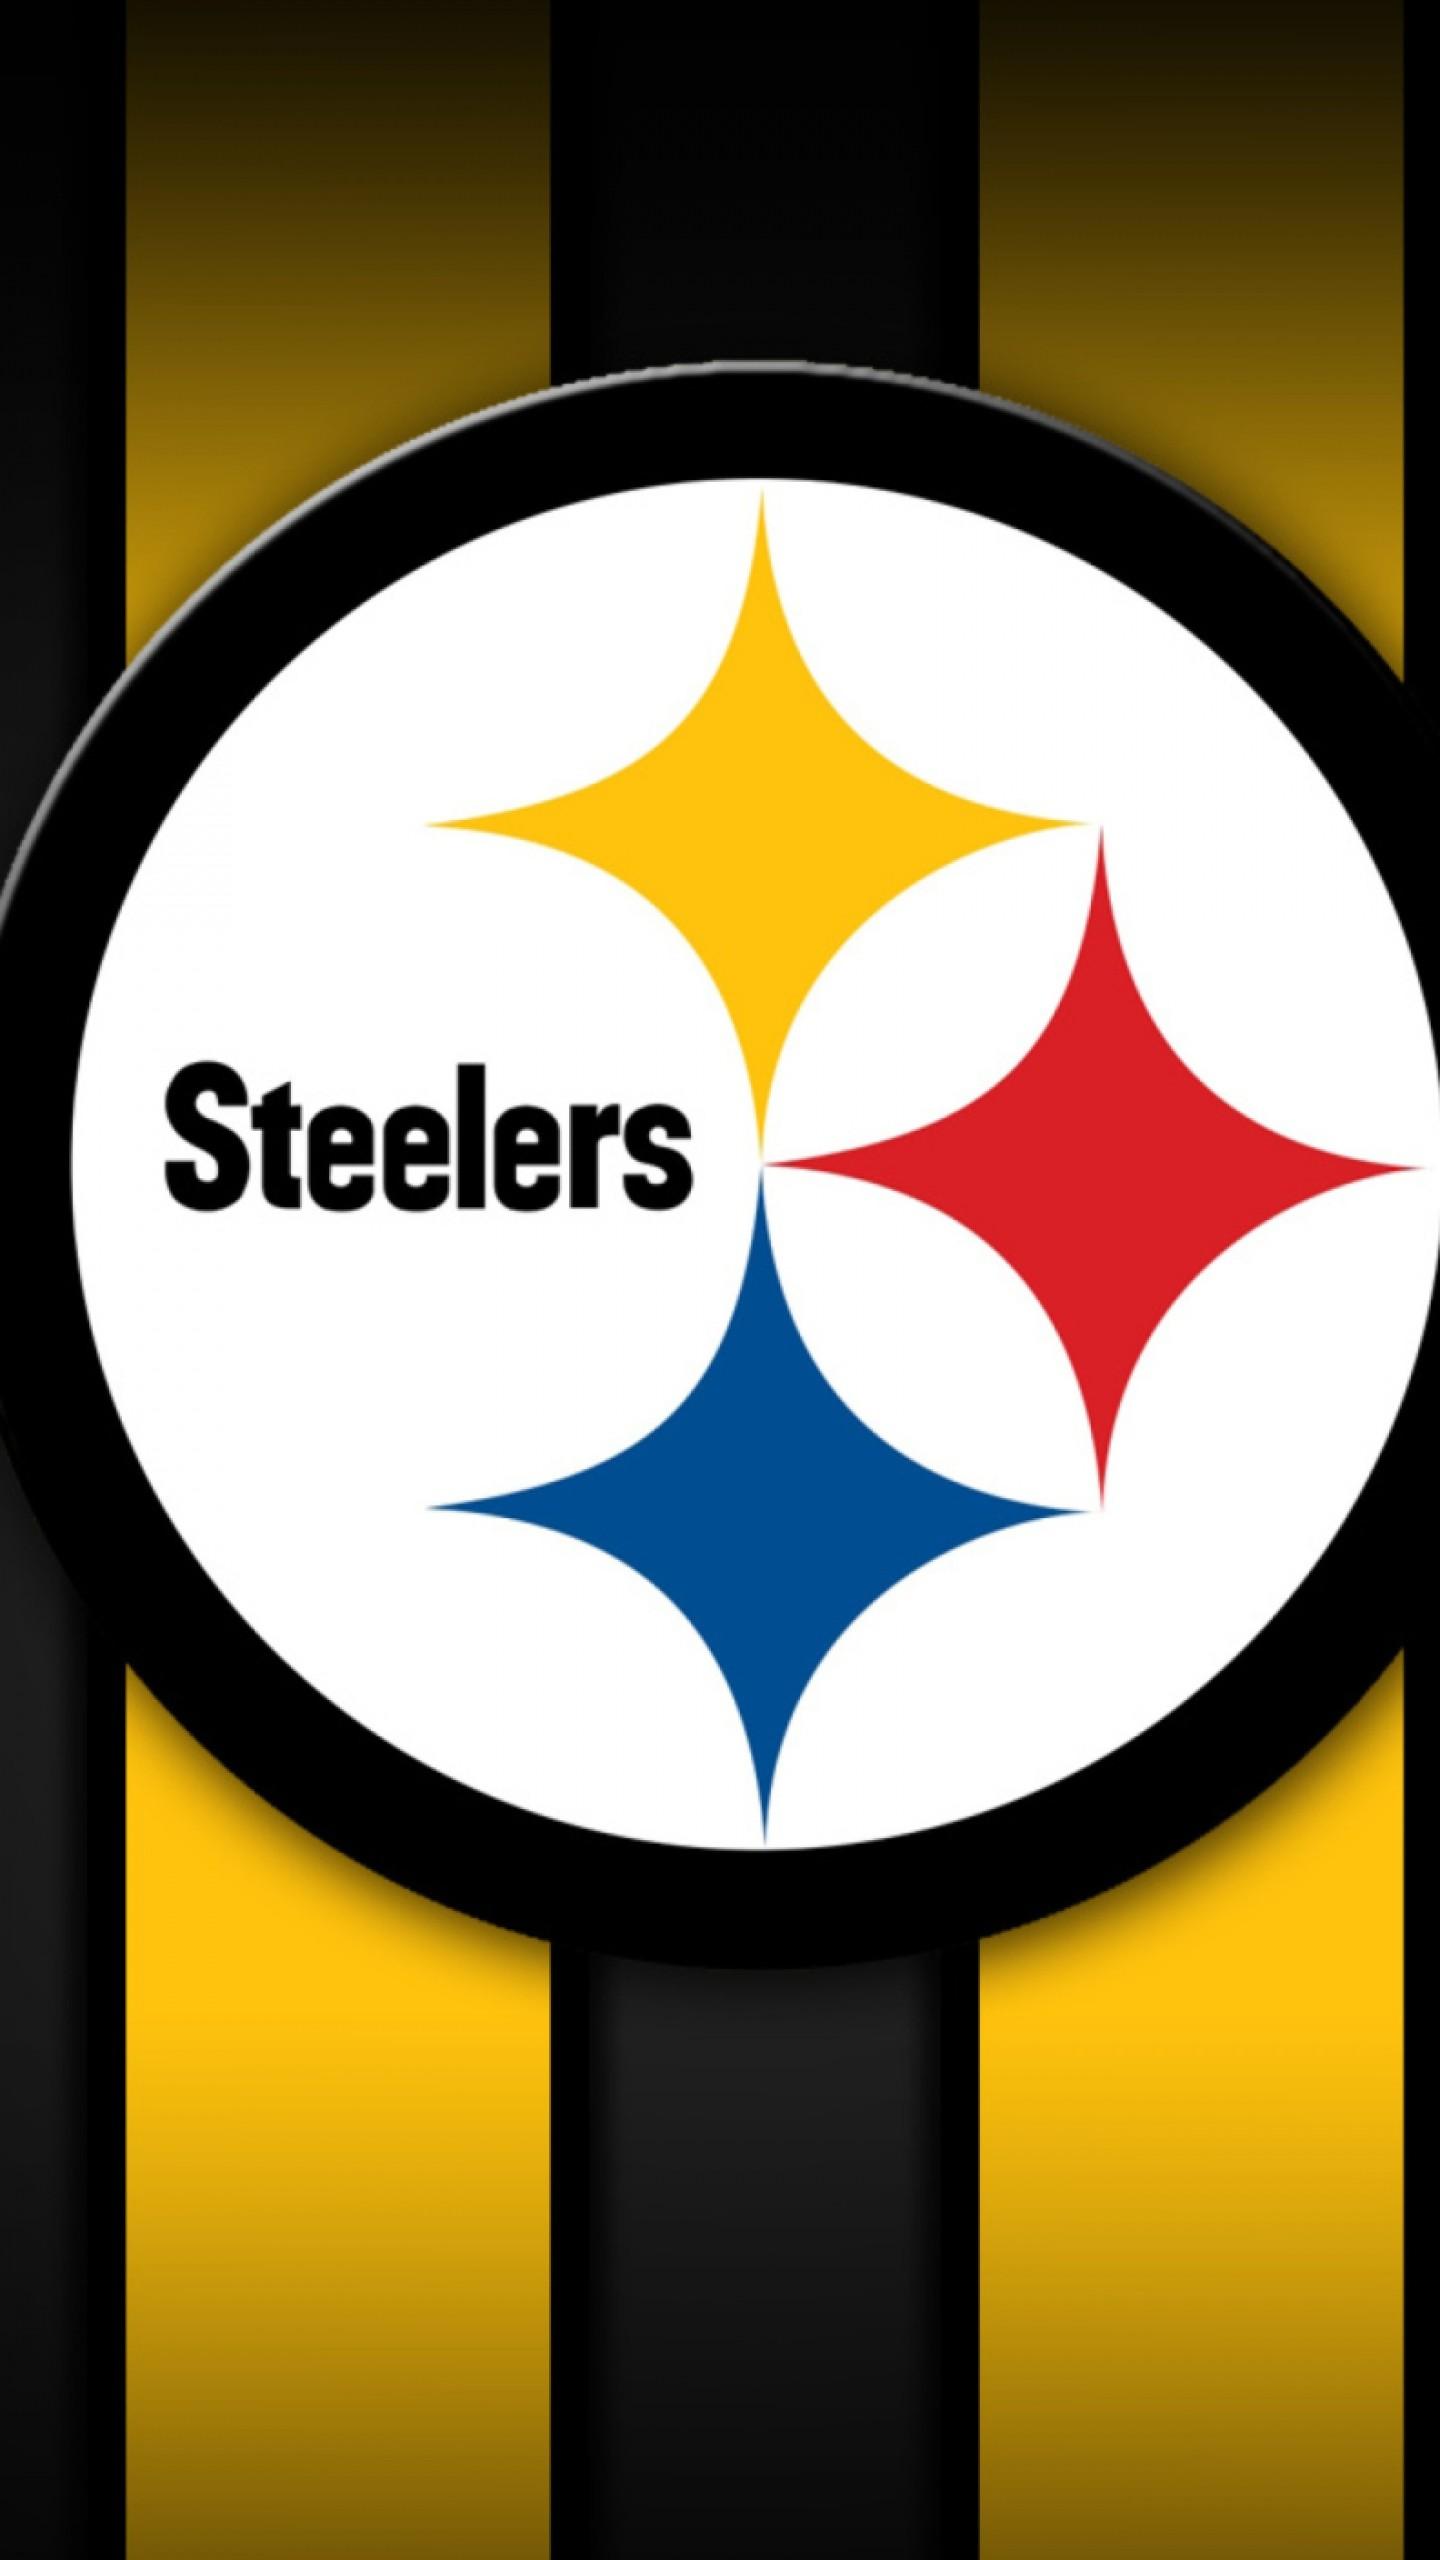 1920x1080 pittsburgh steelers desktop wallpaper 71 images - Steelers background ...